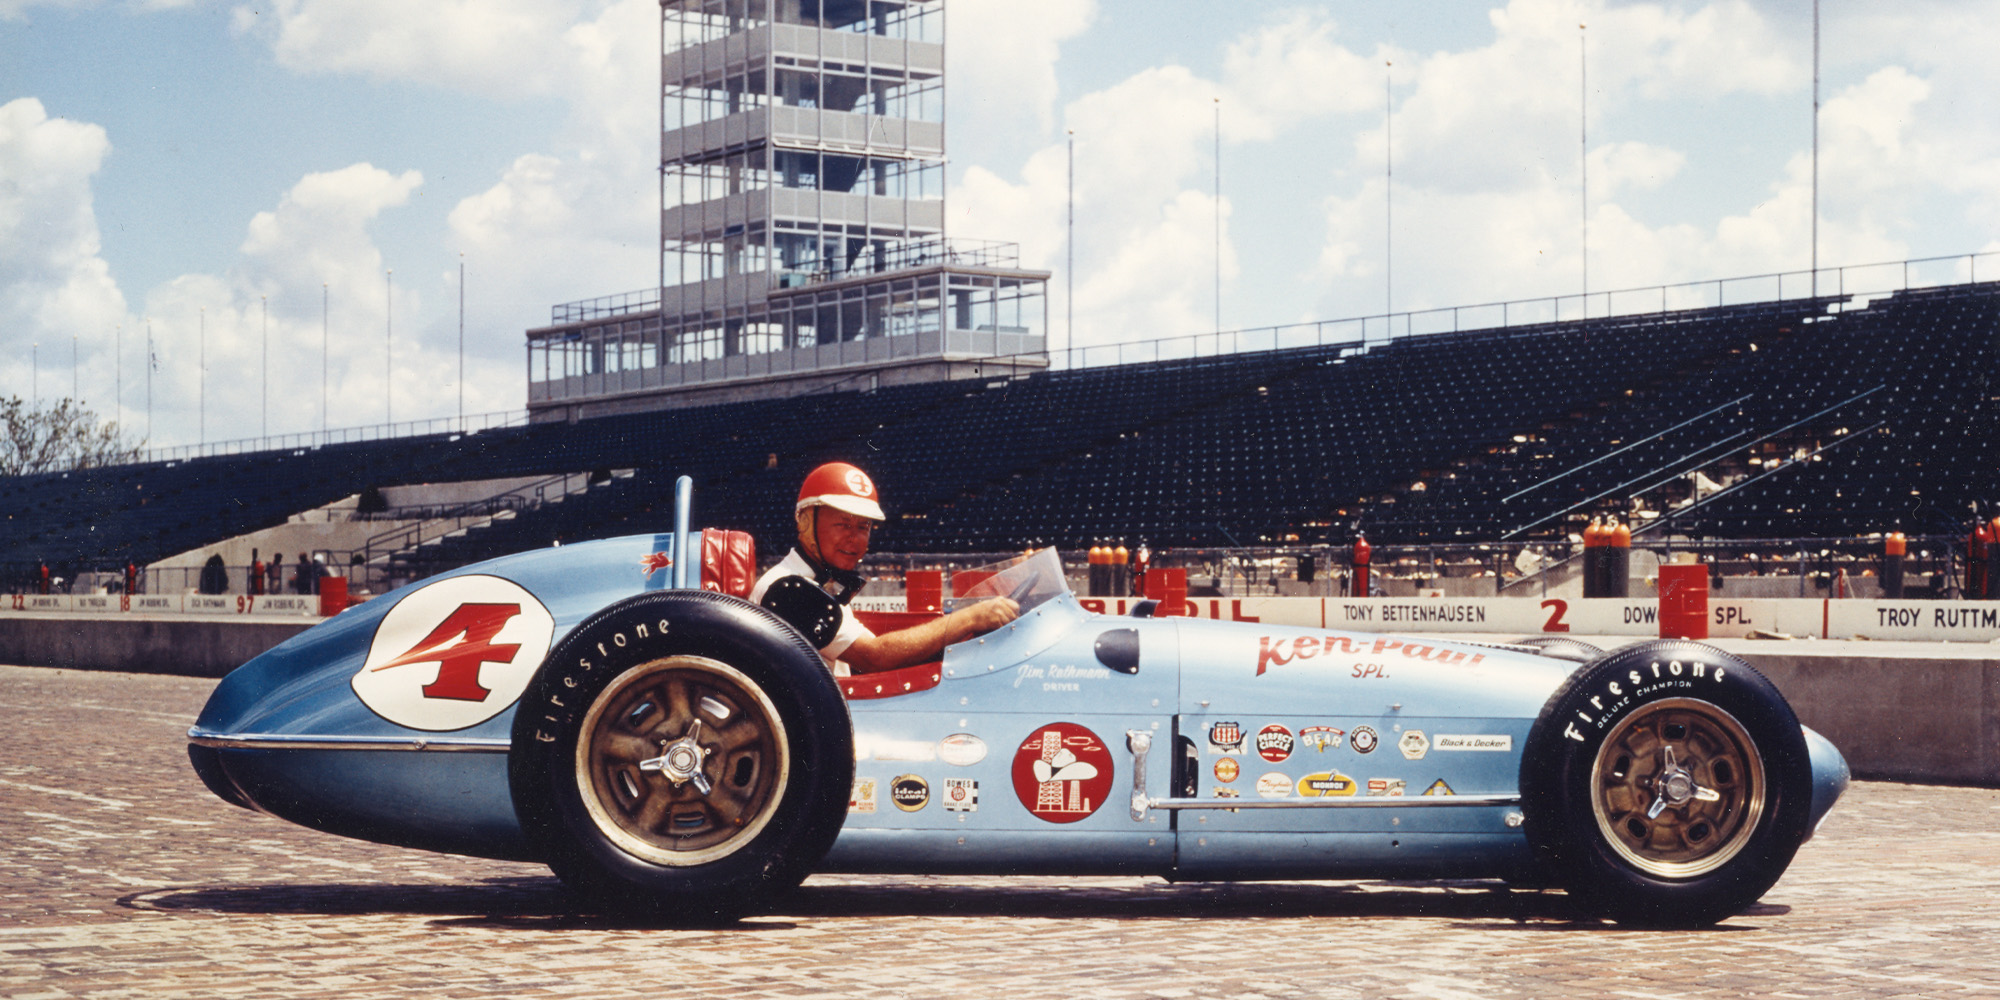 Jim Rathmann in his car portrait shot at the 1960 Indy 500